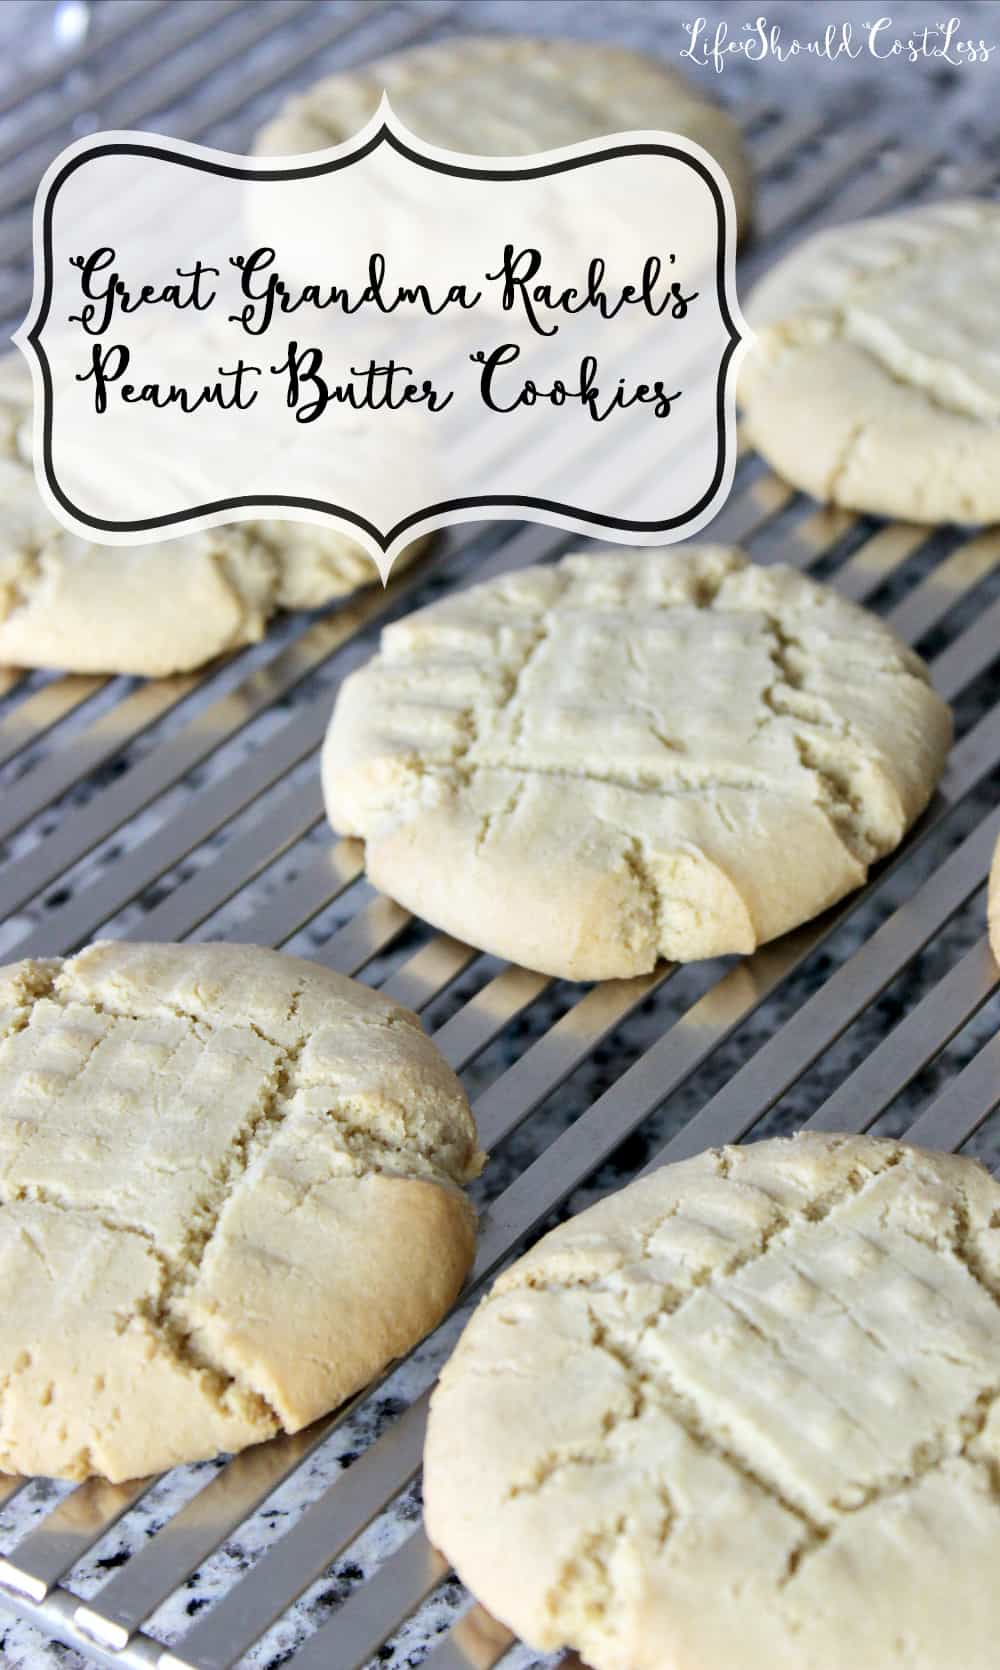 Great Grandma Rachel\'s Peanut Butter Cookies - Life Should Cost Less